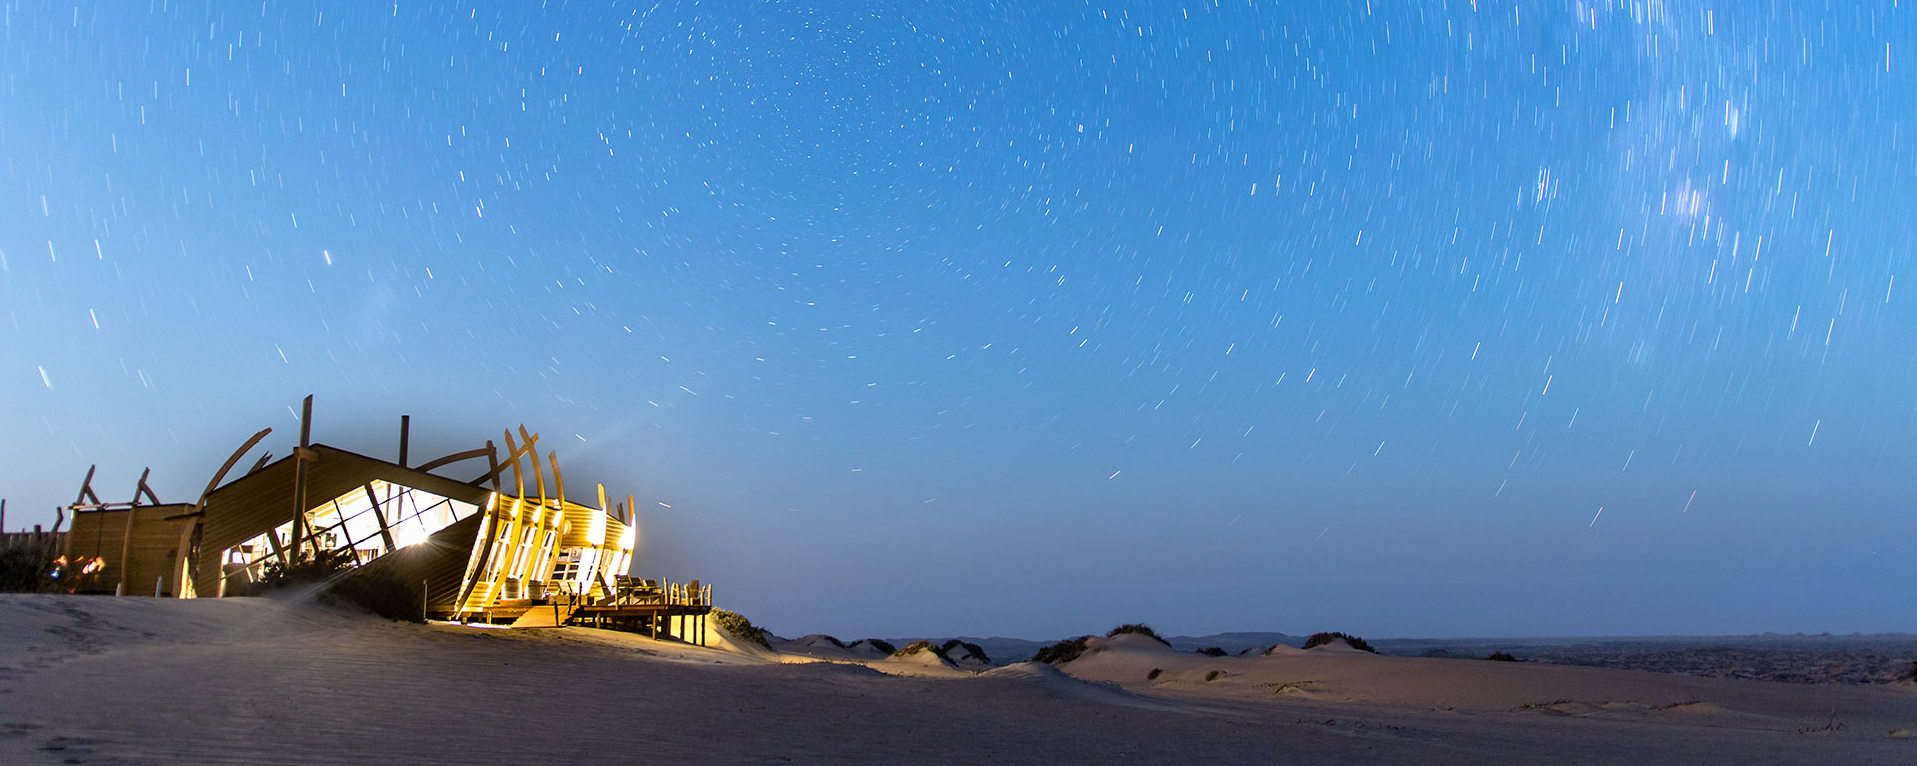 night-sky-skeleton-coast-namibia